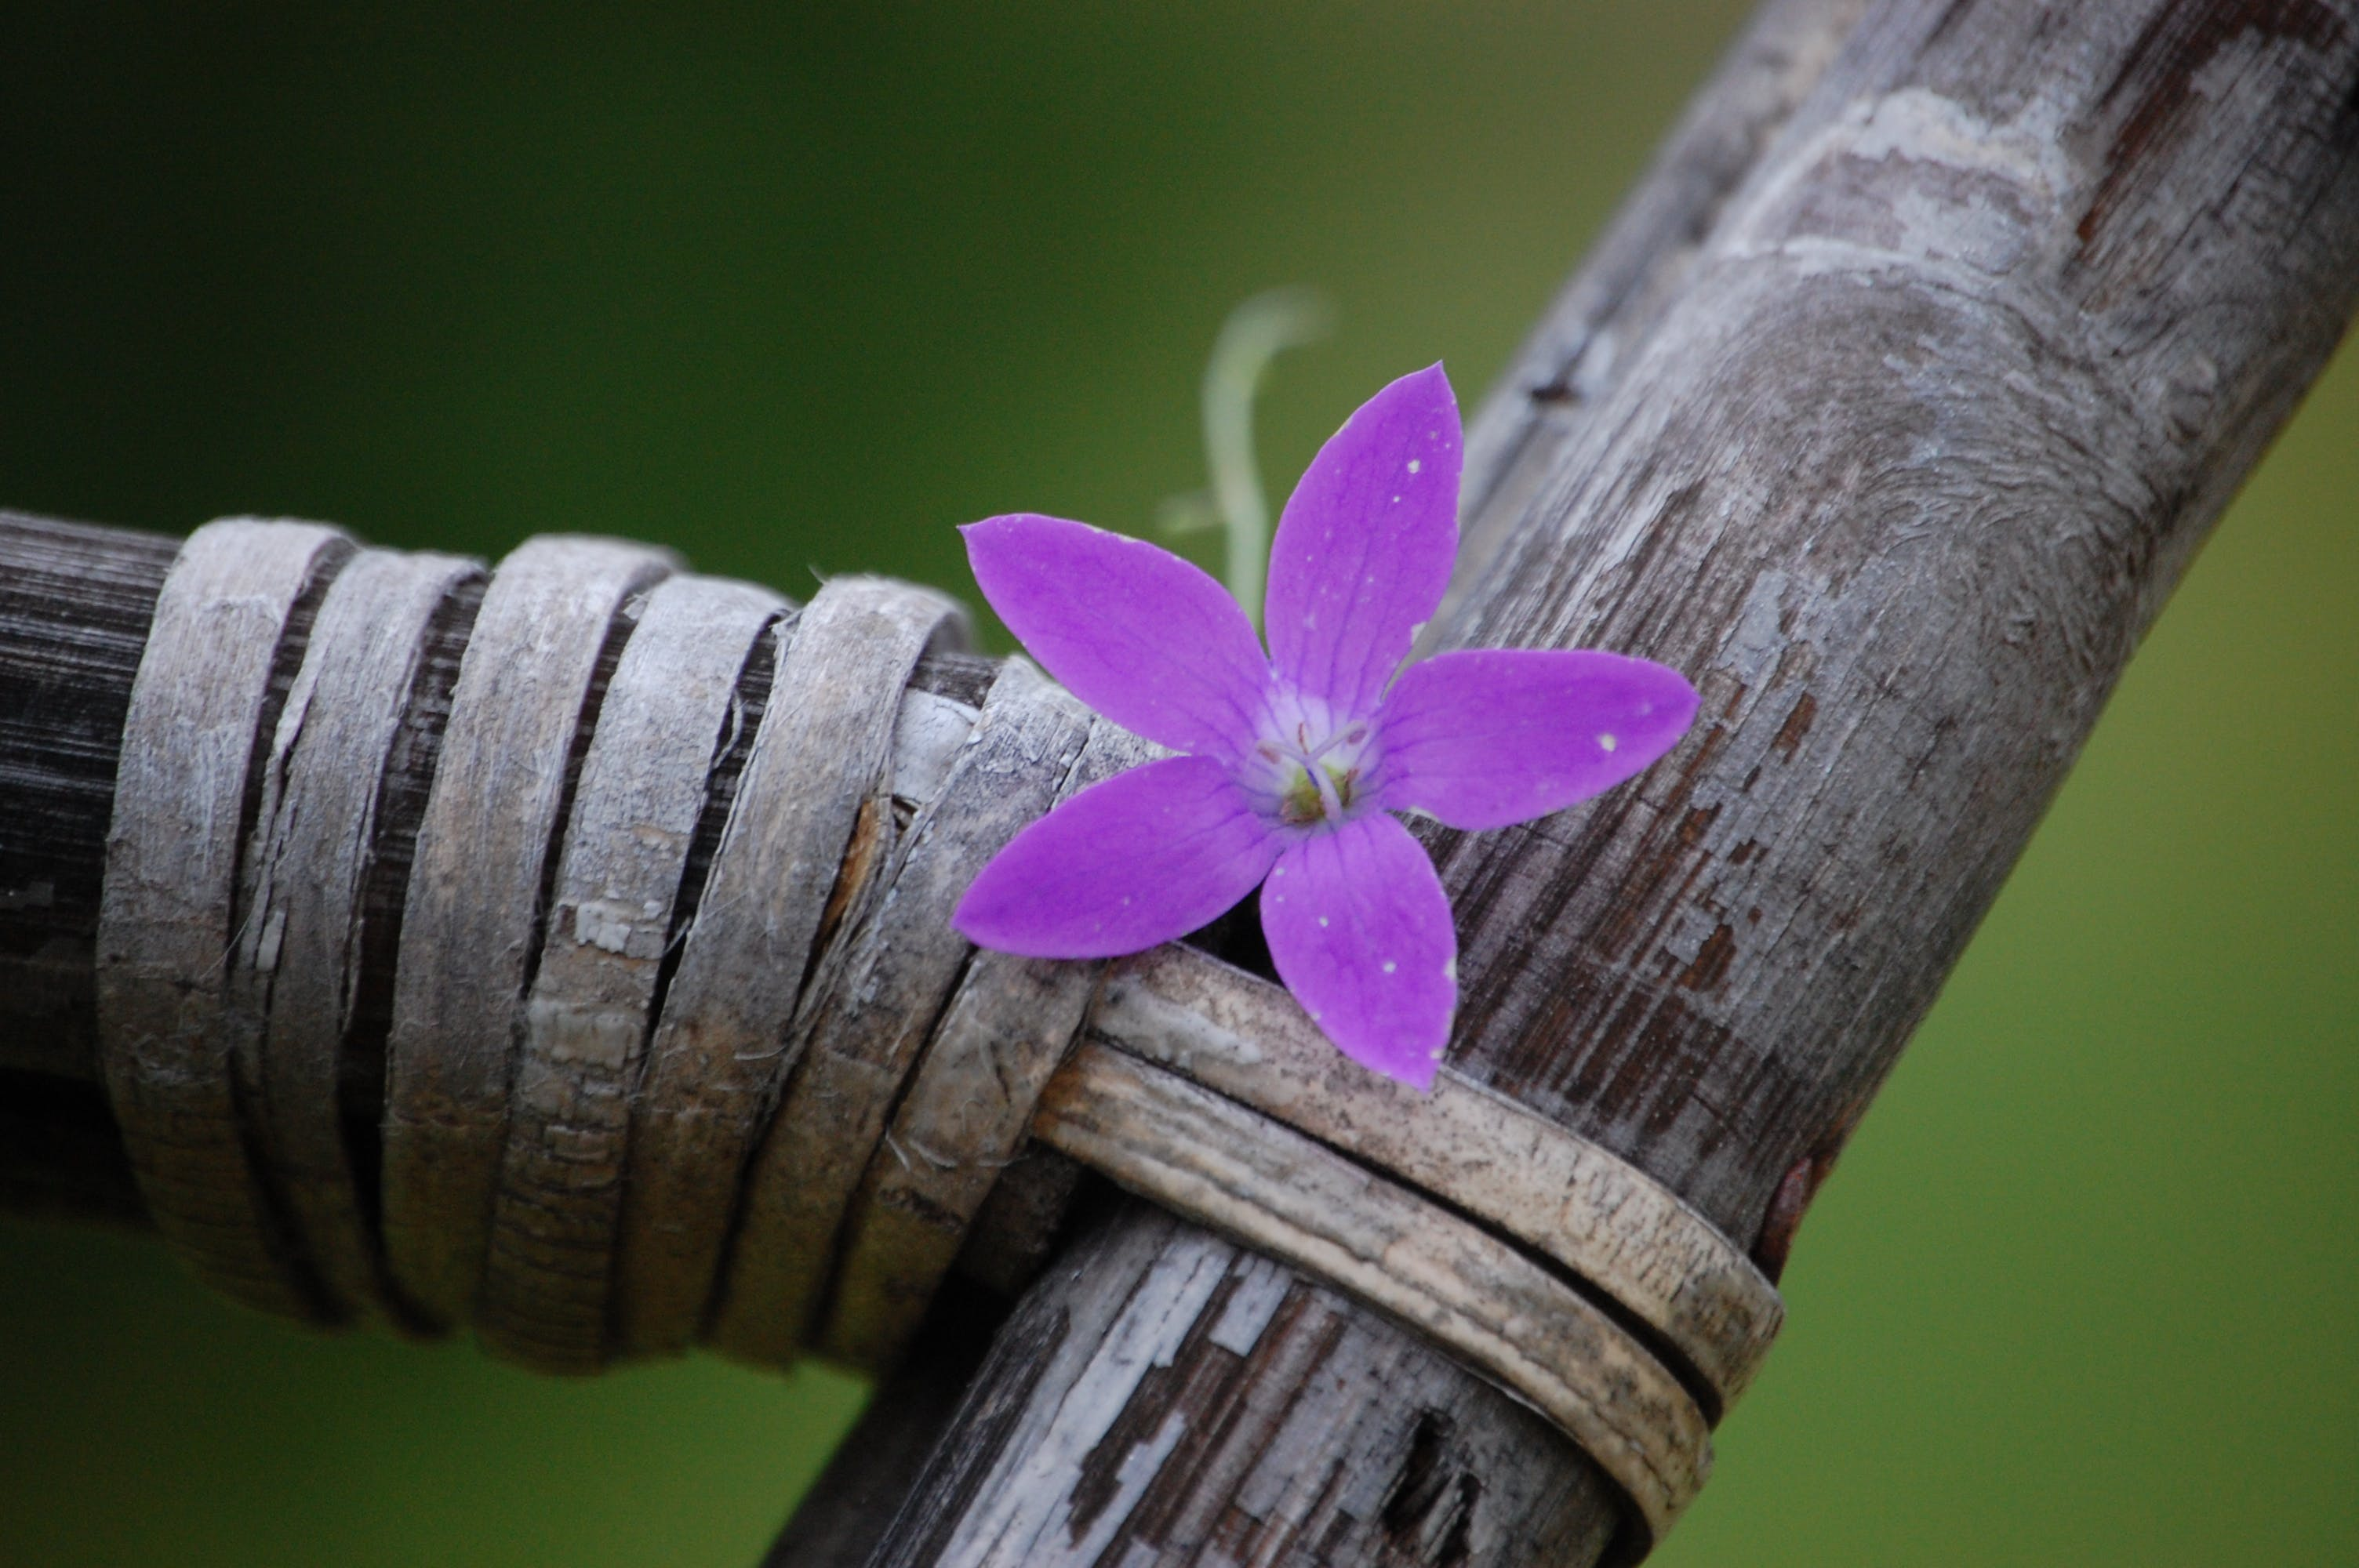 Fotos de stock gratuitas de flo violeta